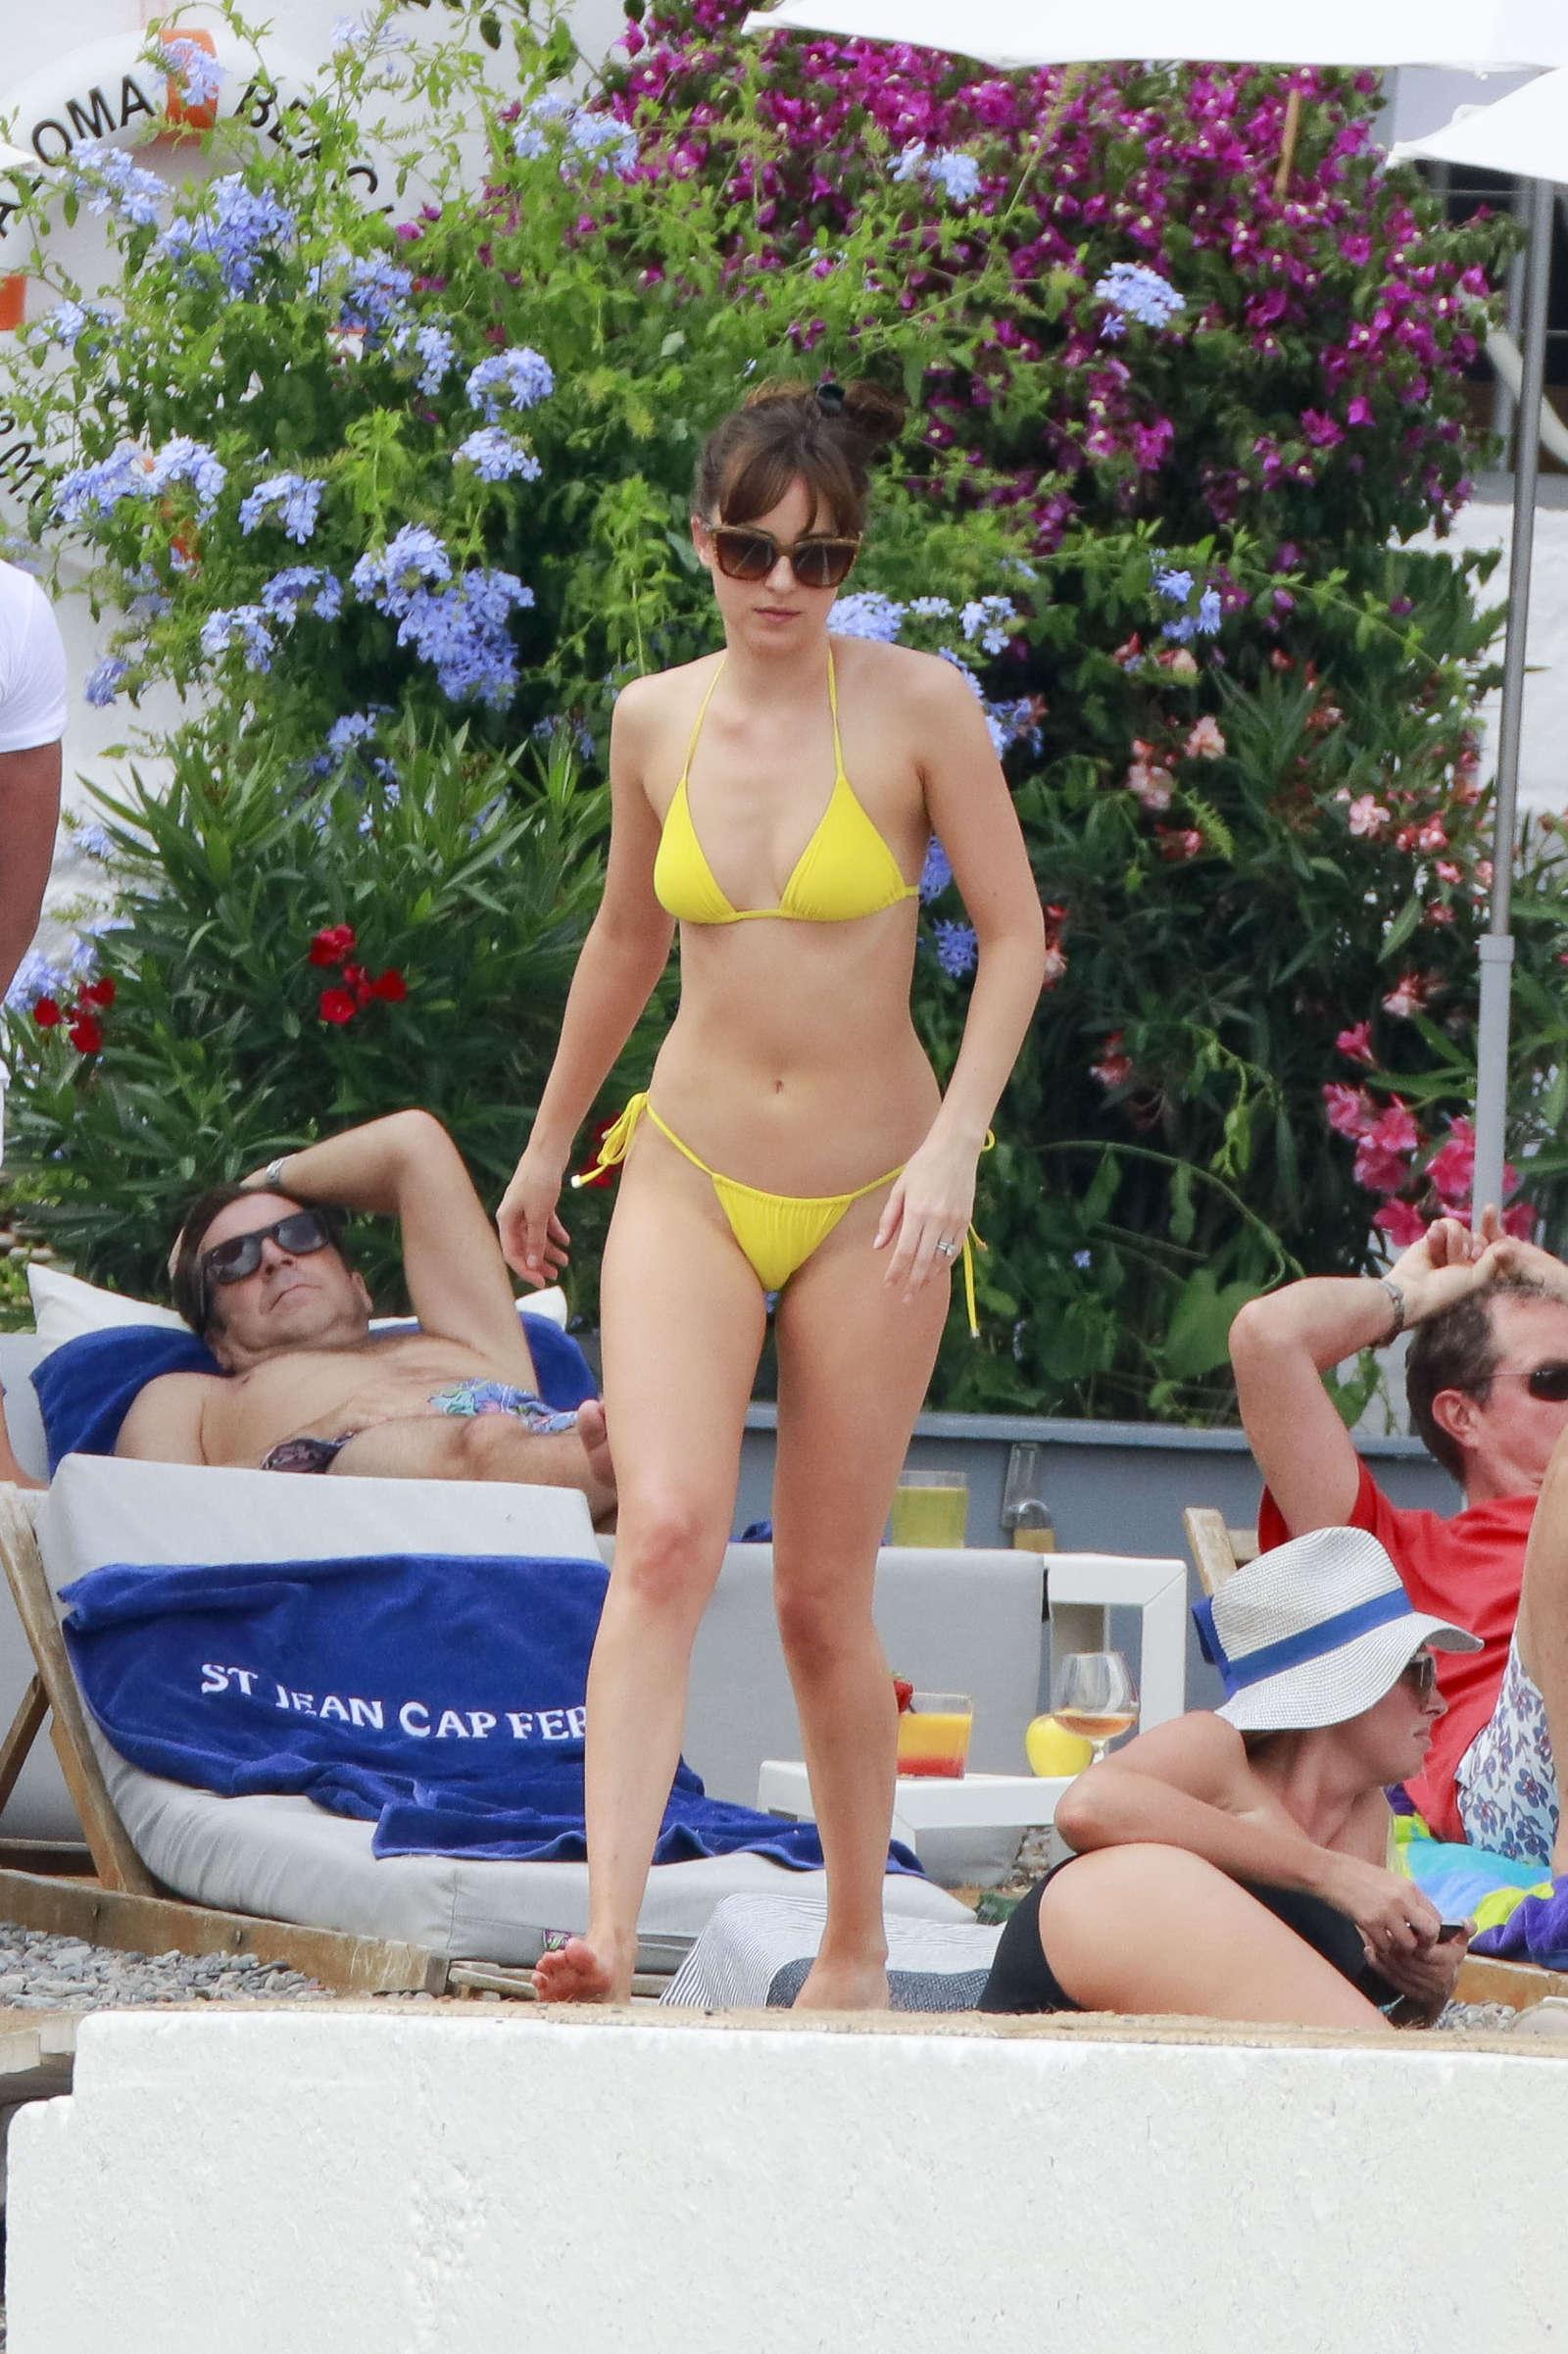 Dakota Johnson 2016 : Dakota Johnson in Yellow Bikini 2016 -23